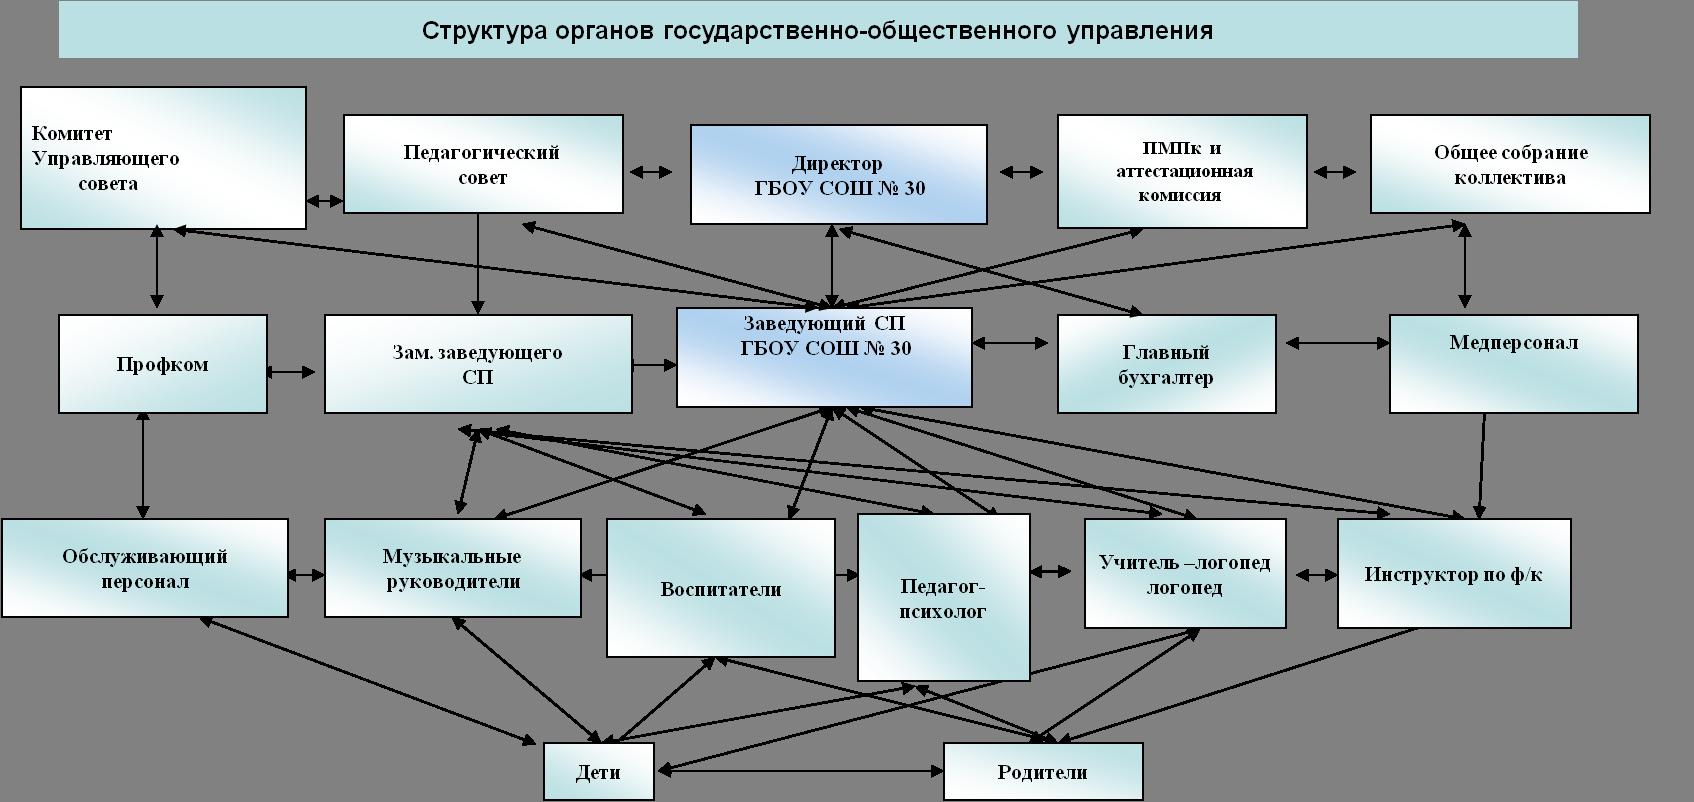 risunok1